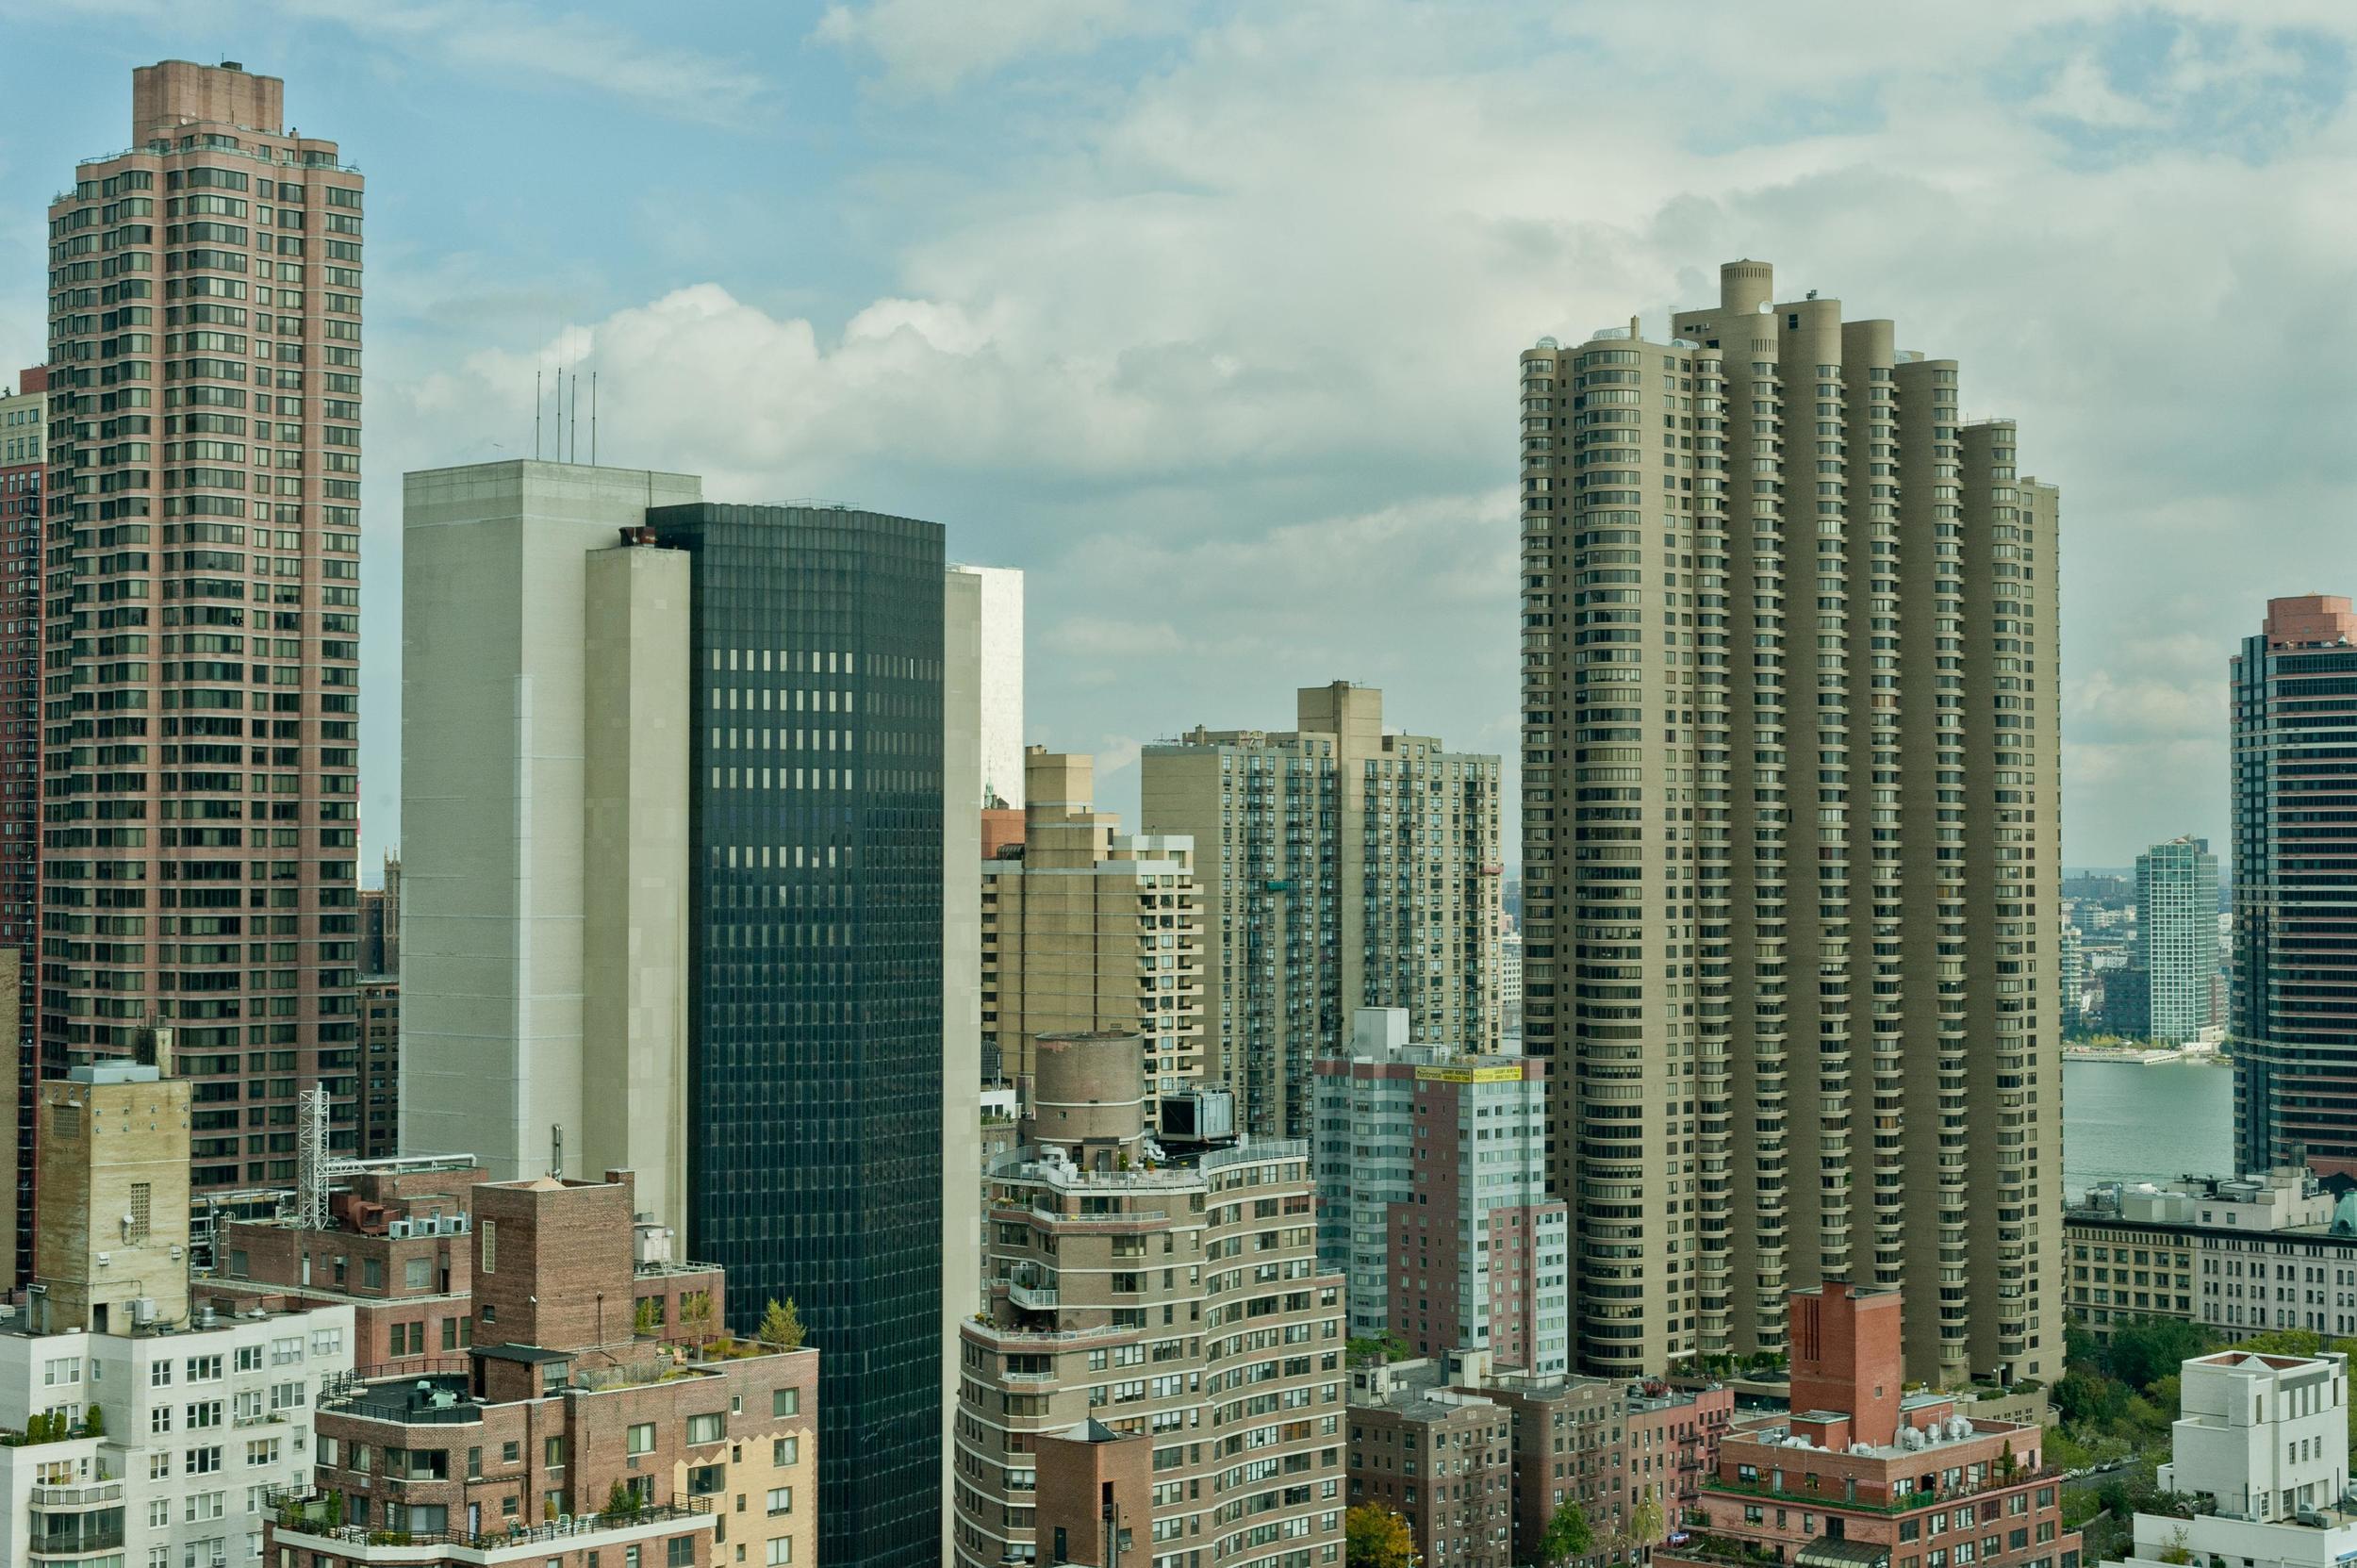 cityscape-nyc-east-river_22851448644_o.jpg